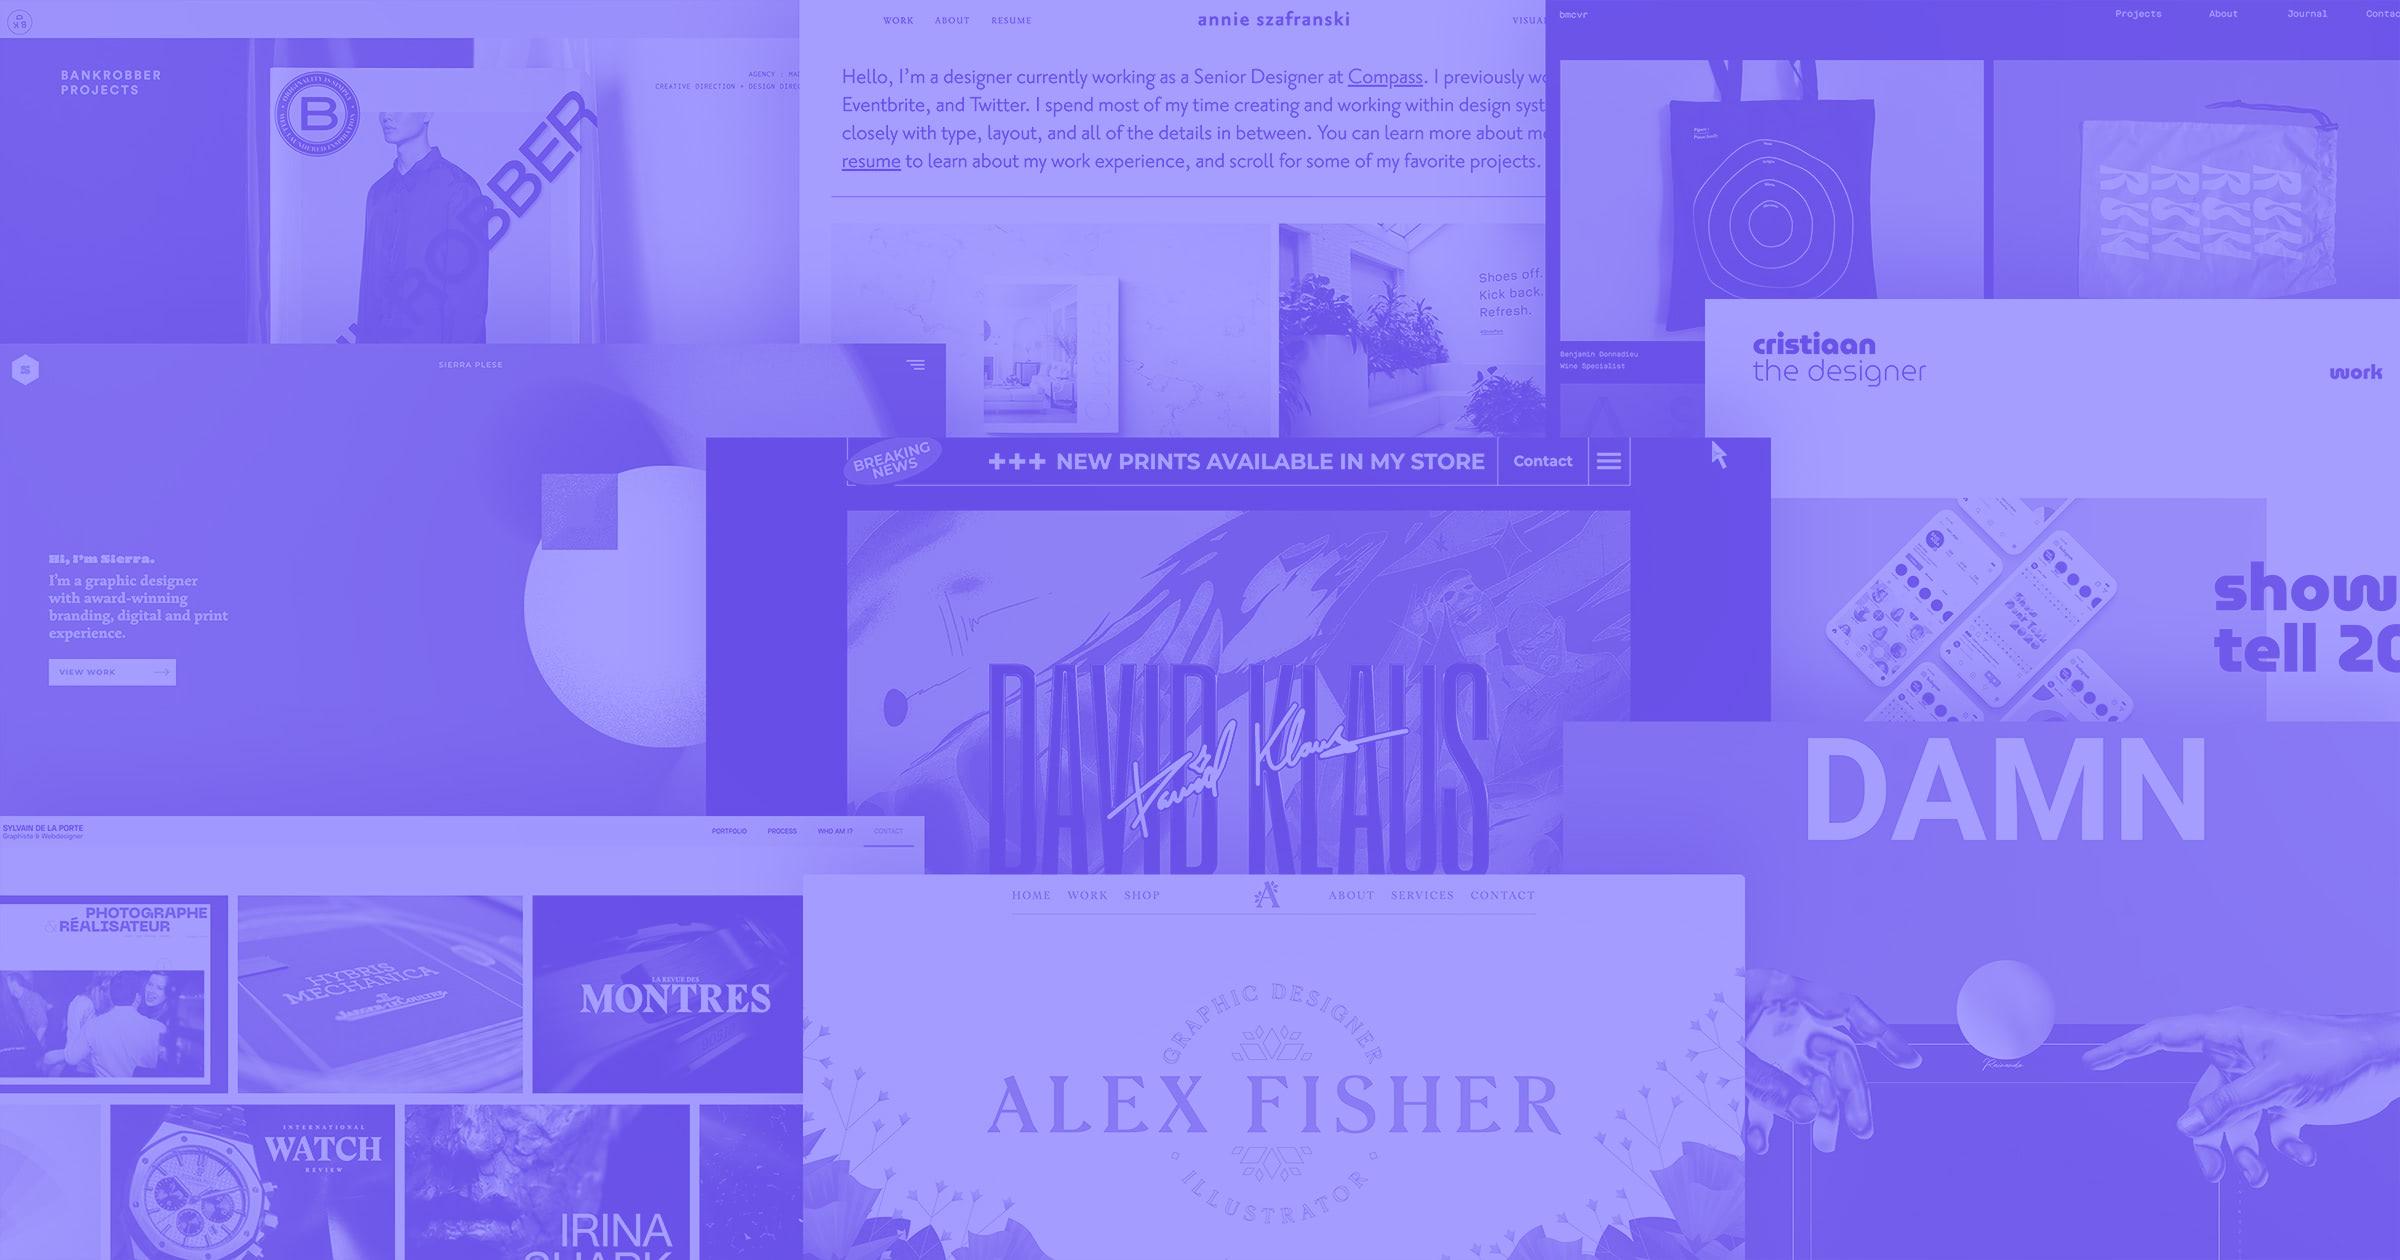 20 inspiring graphic design portfolios you need to see | Webflow Blog